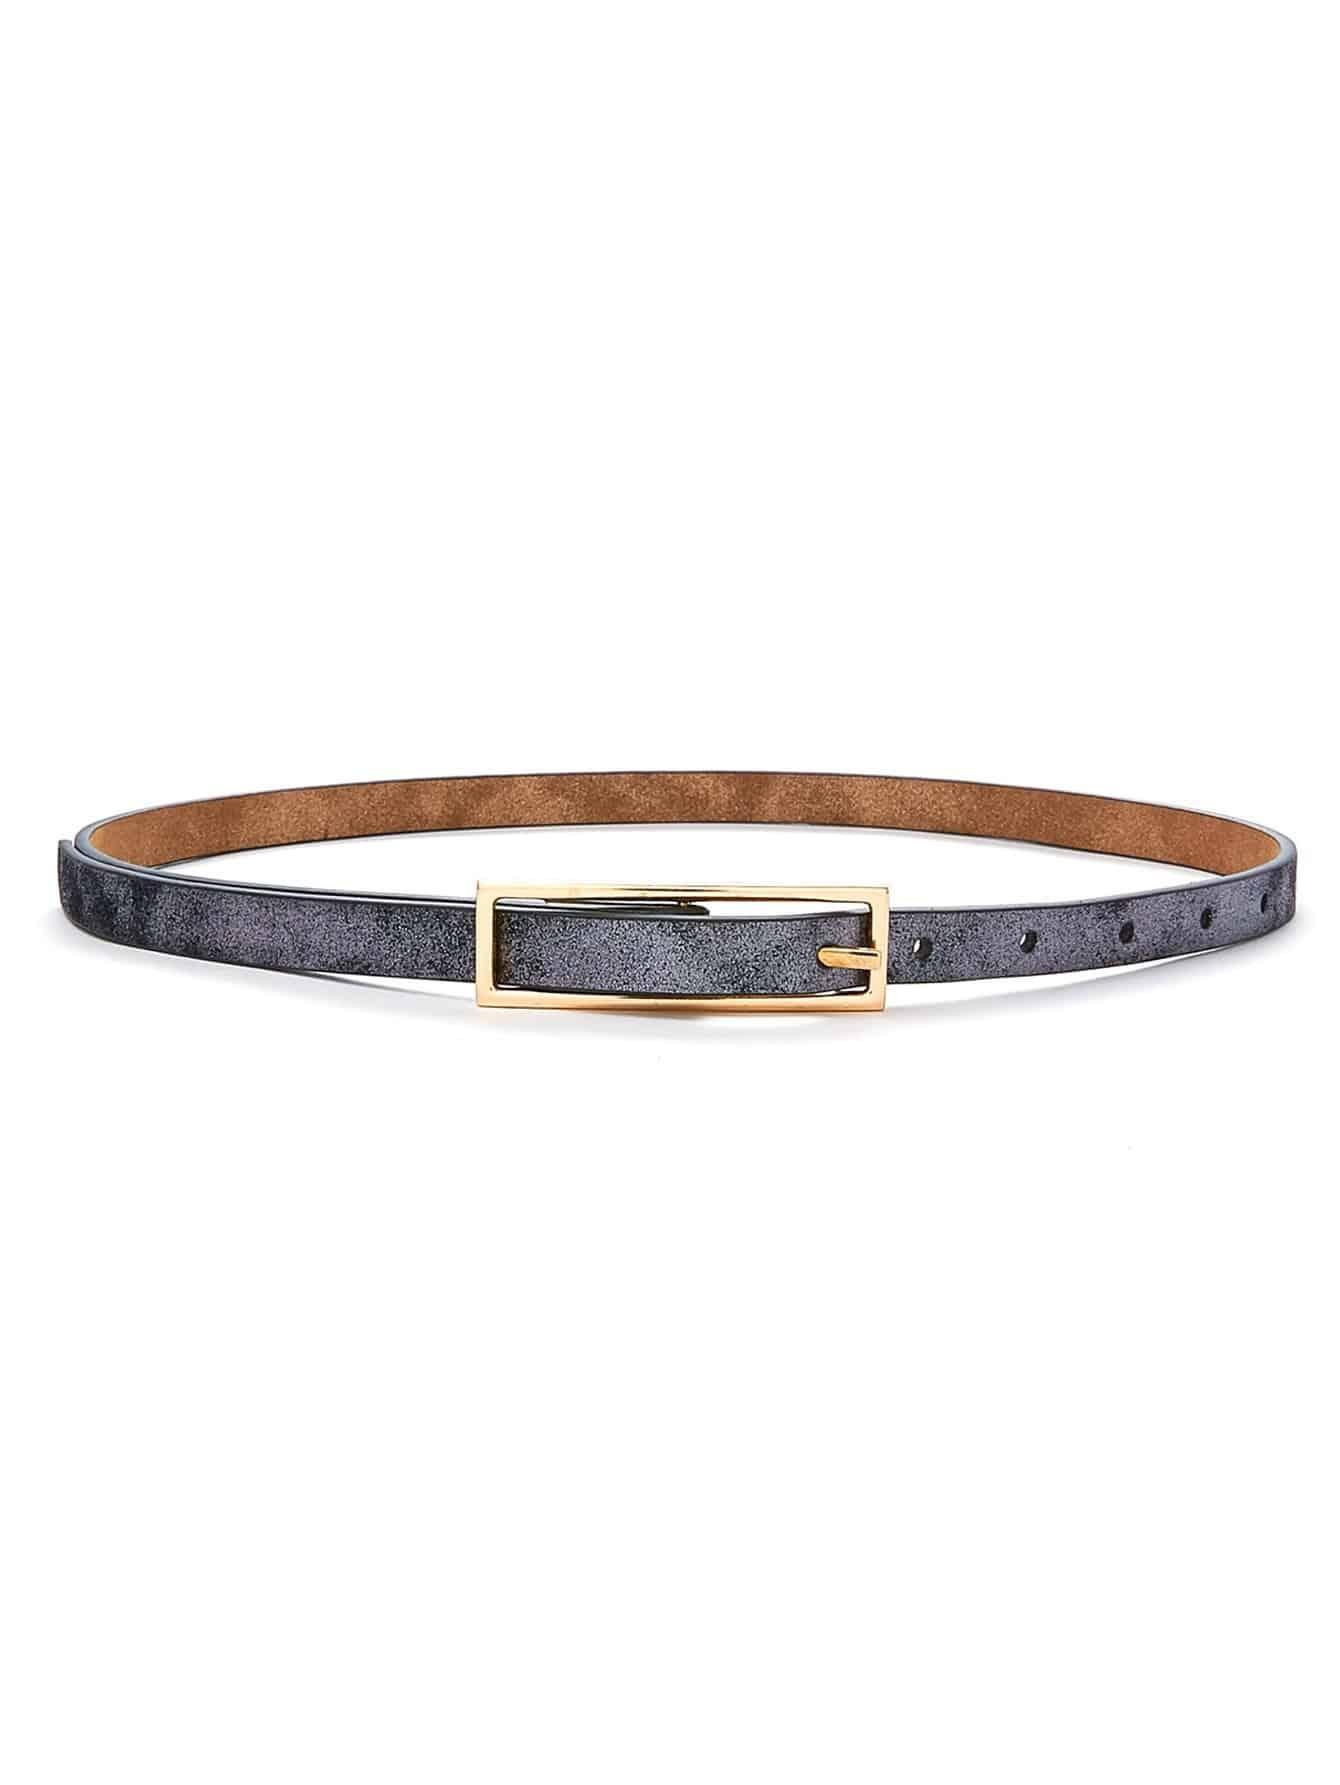 Square Buckle Skinny Belt women fashion square buckle basic dress leatherette wide belt